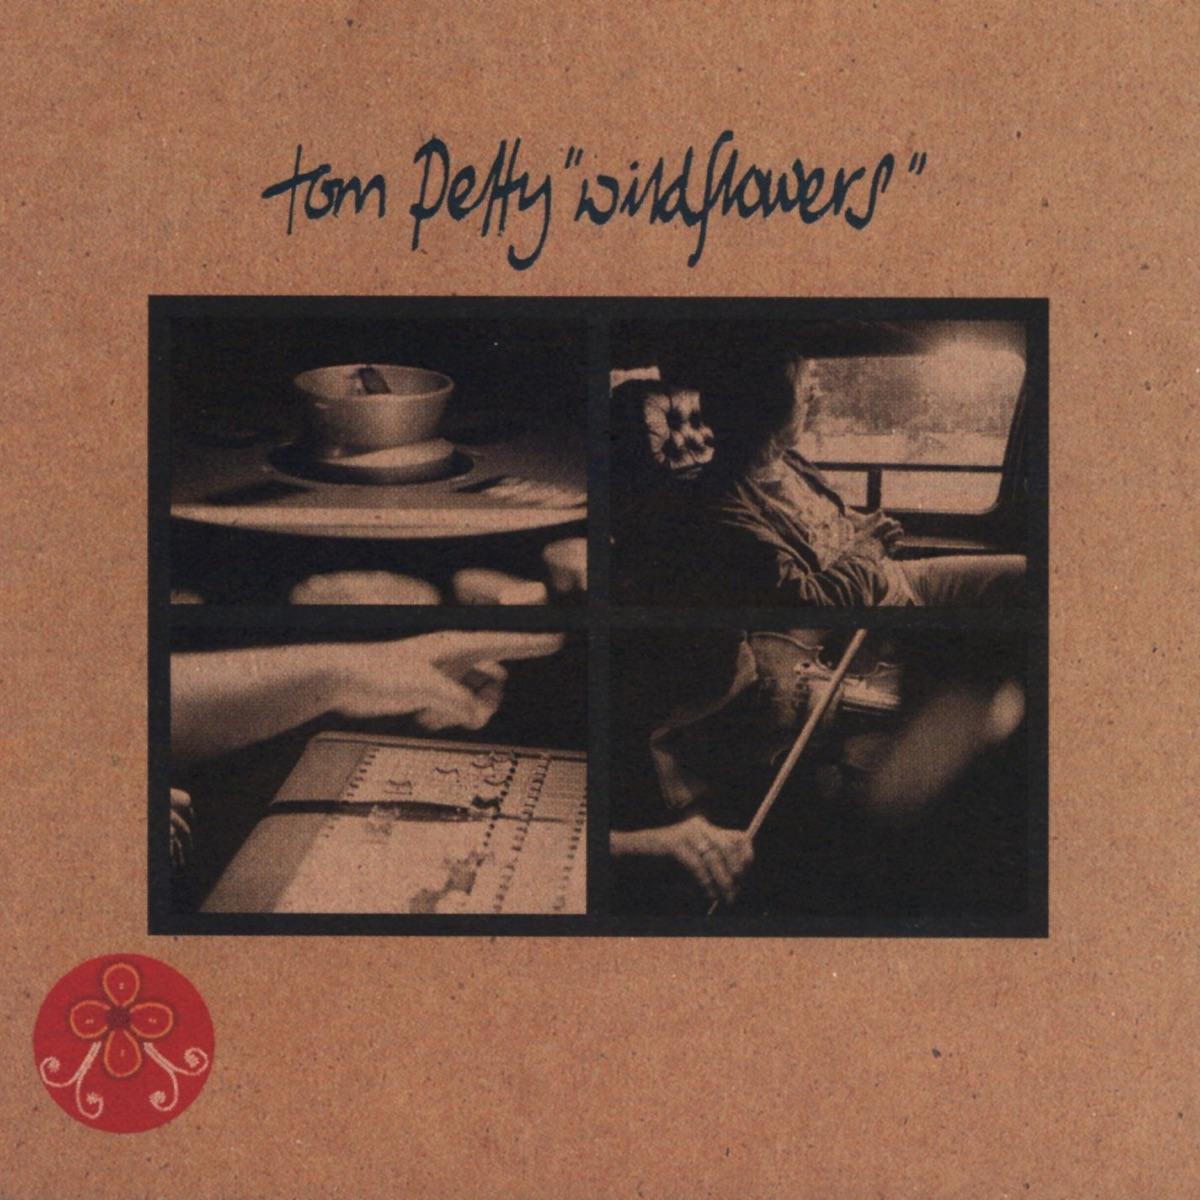 Wildflowers Tom Petty CD cover